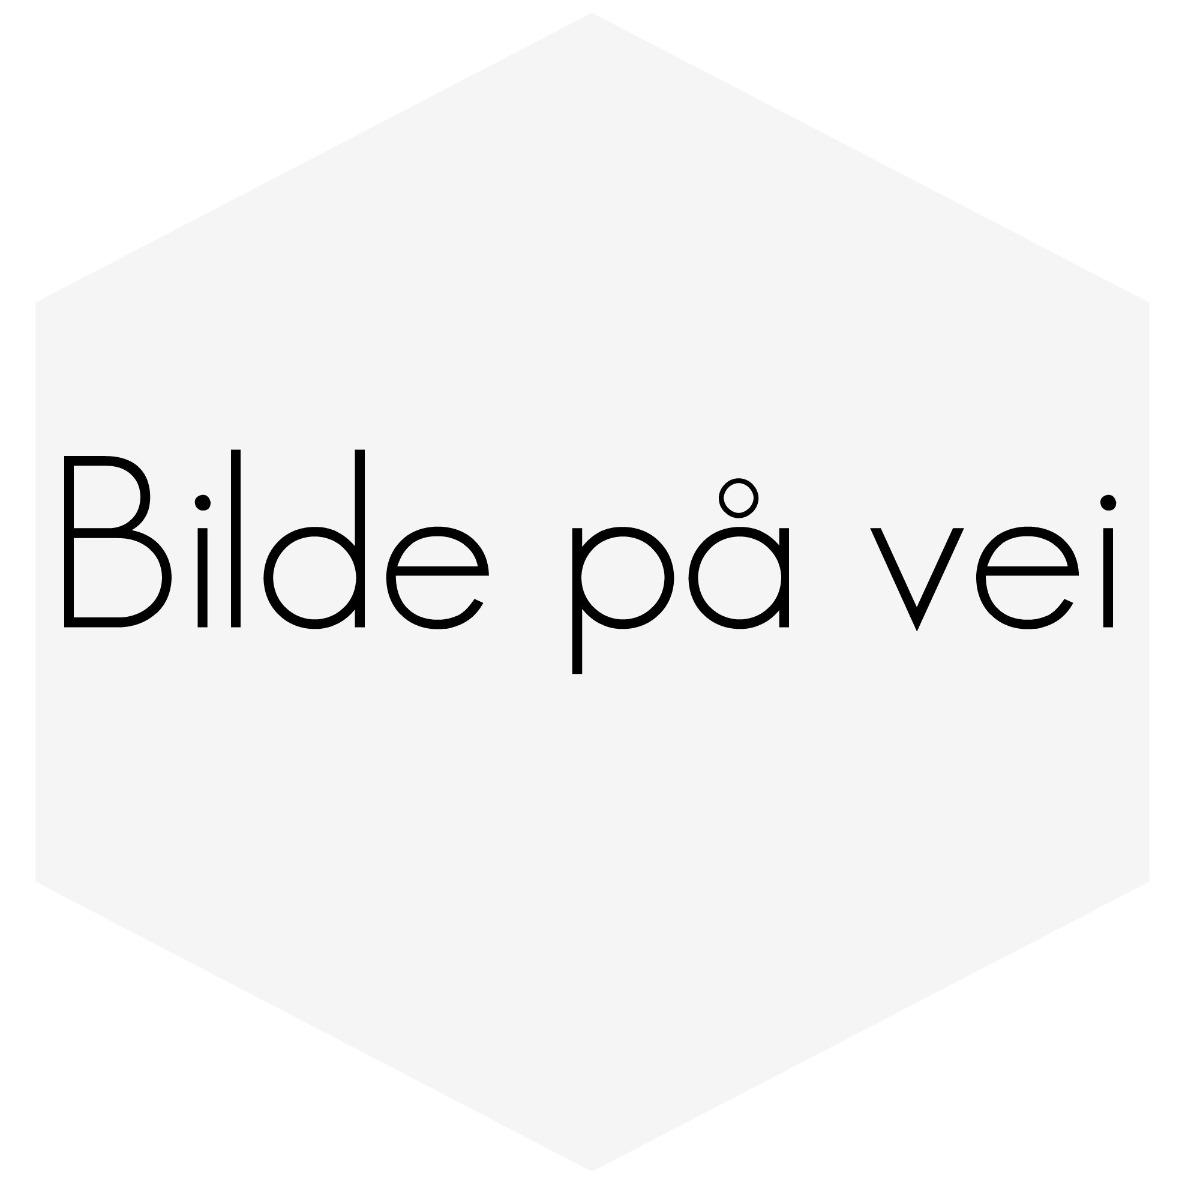 STØTDEMPER BILSTEIN B6/Racing 240/260 FORAN pris stk